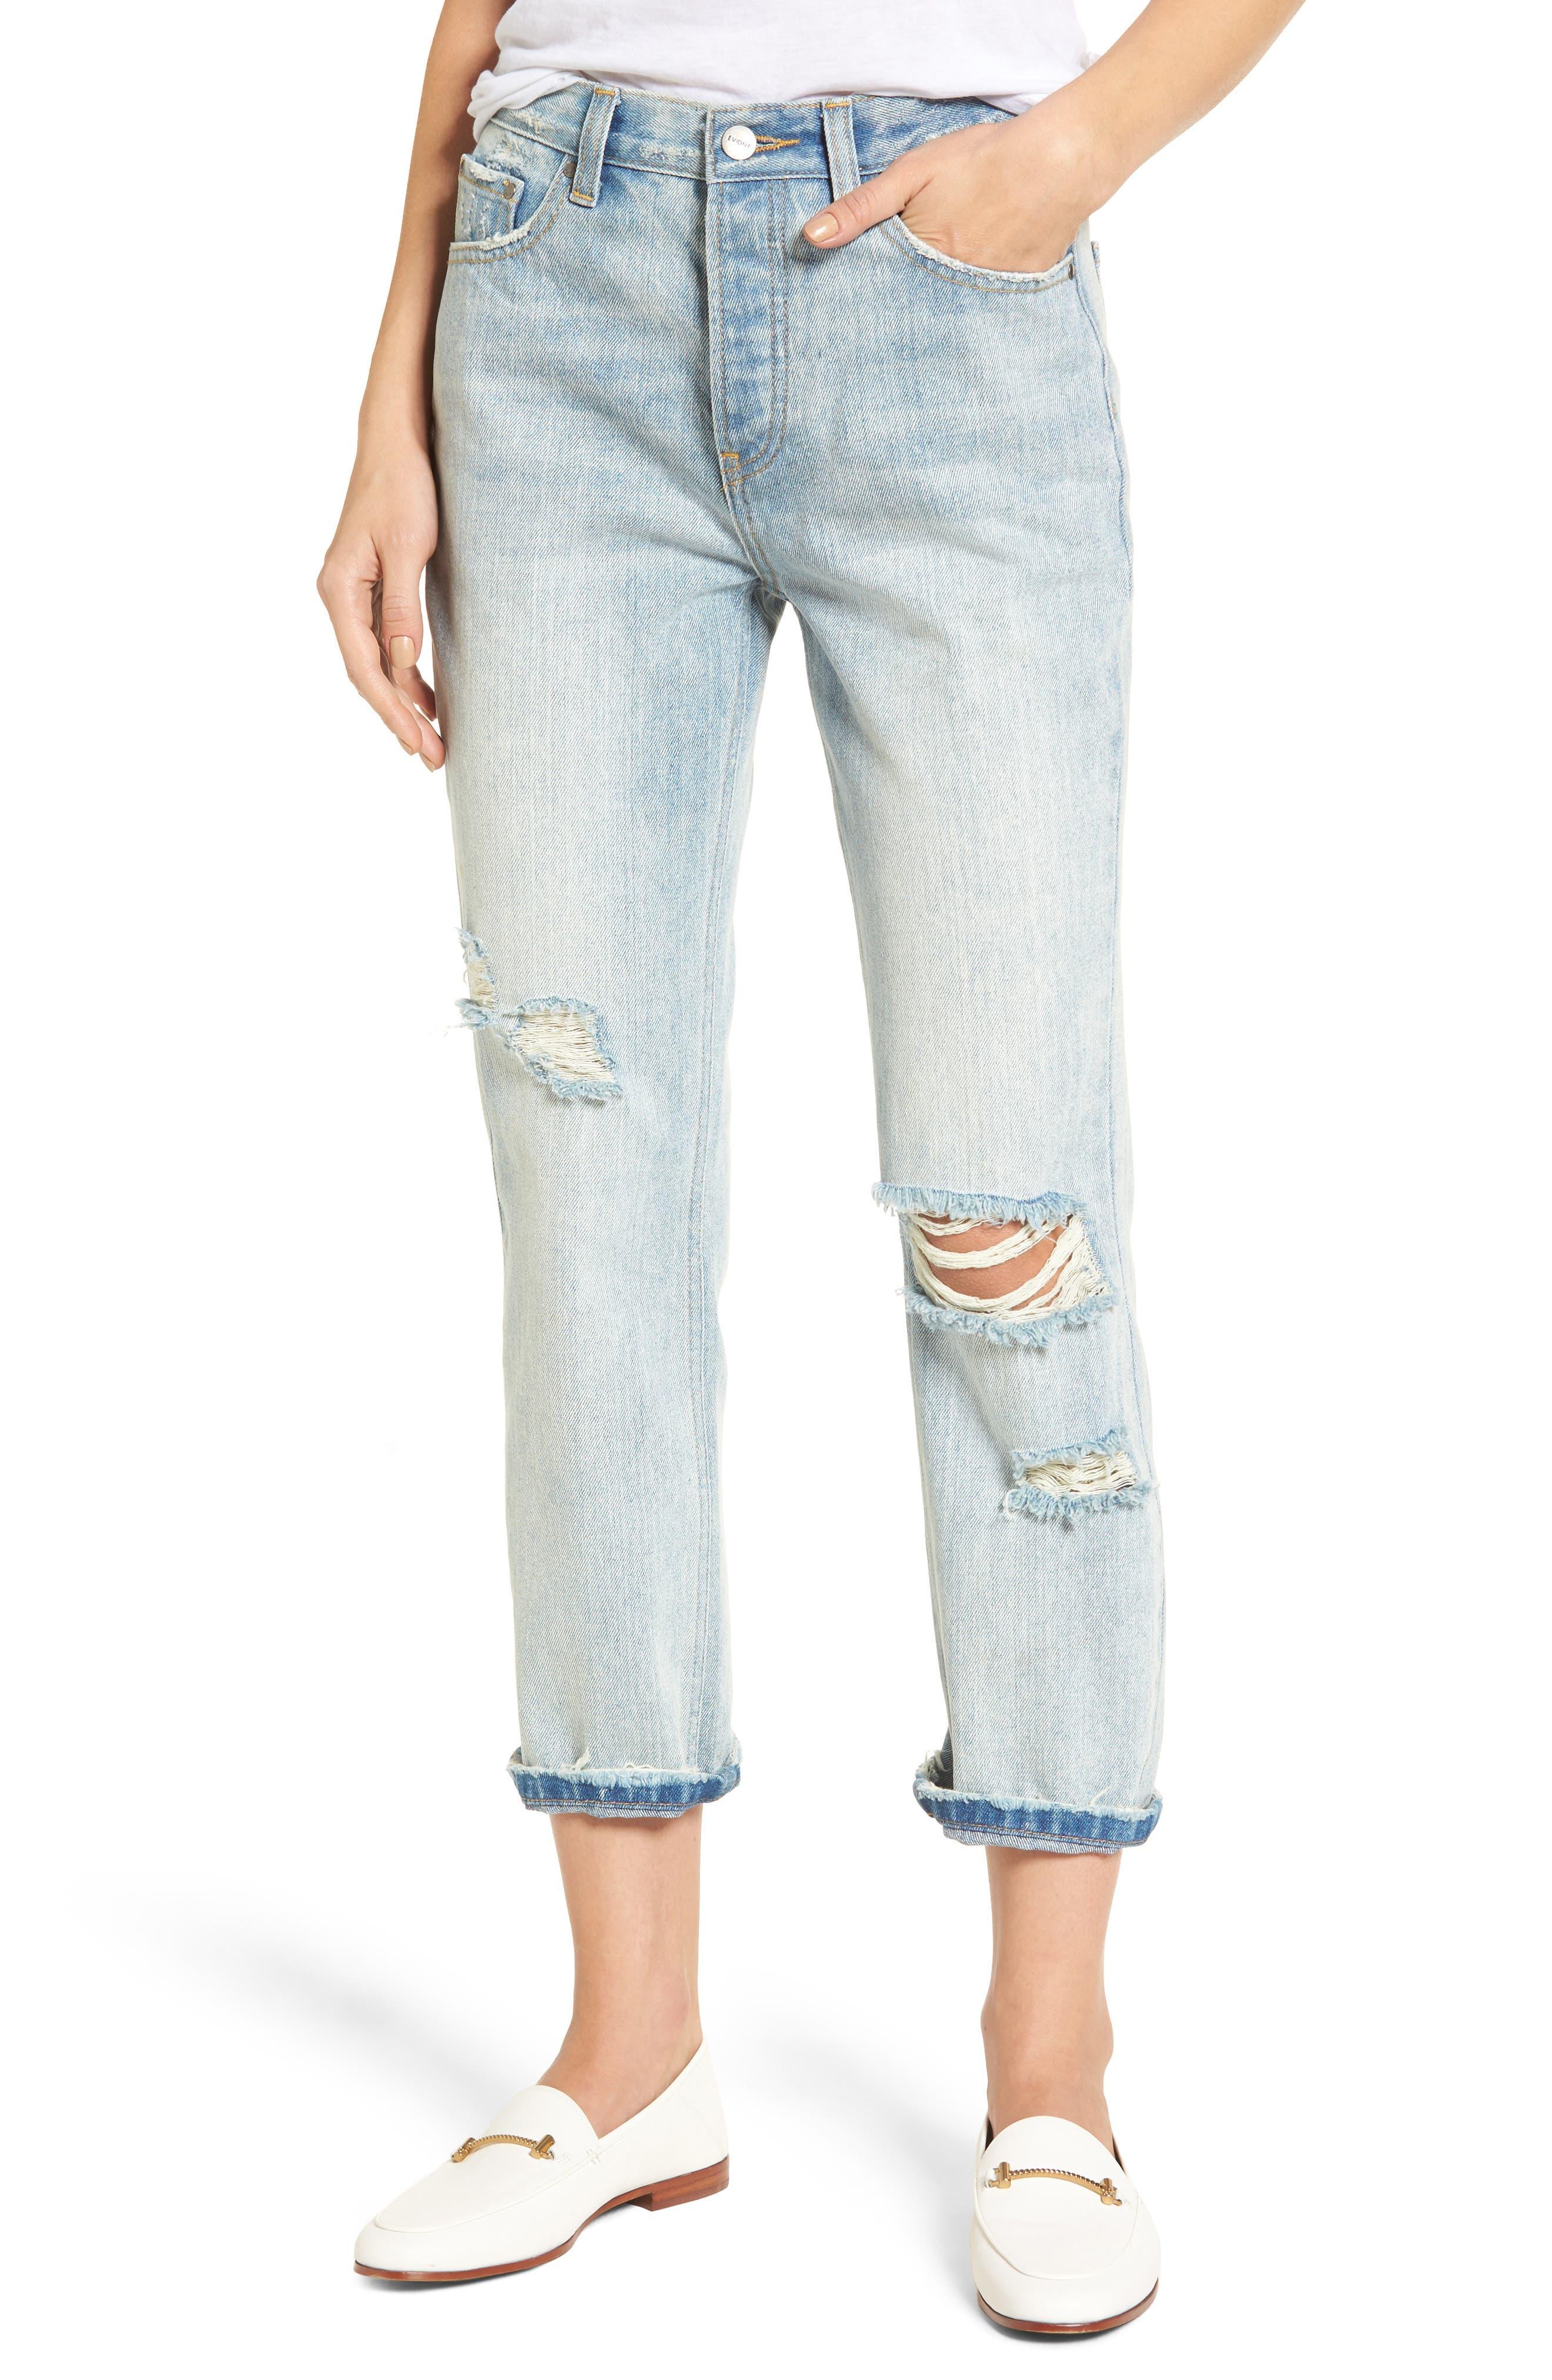 Main Image - EVIDNT Ghent Boyfriend Jeans (Palms)